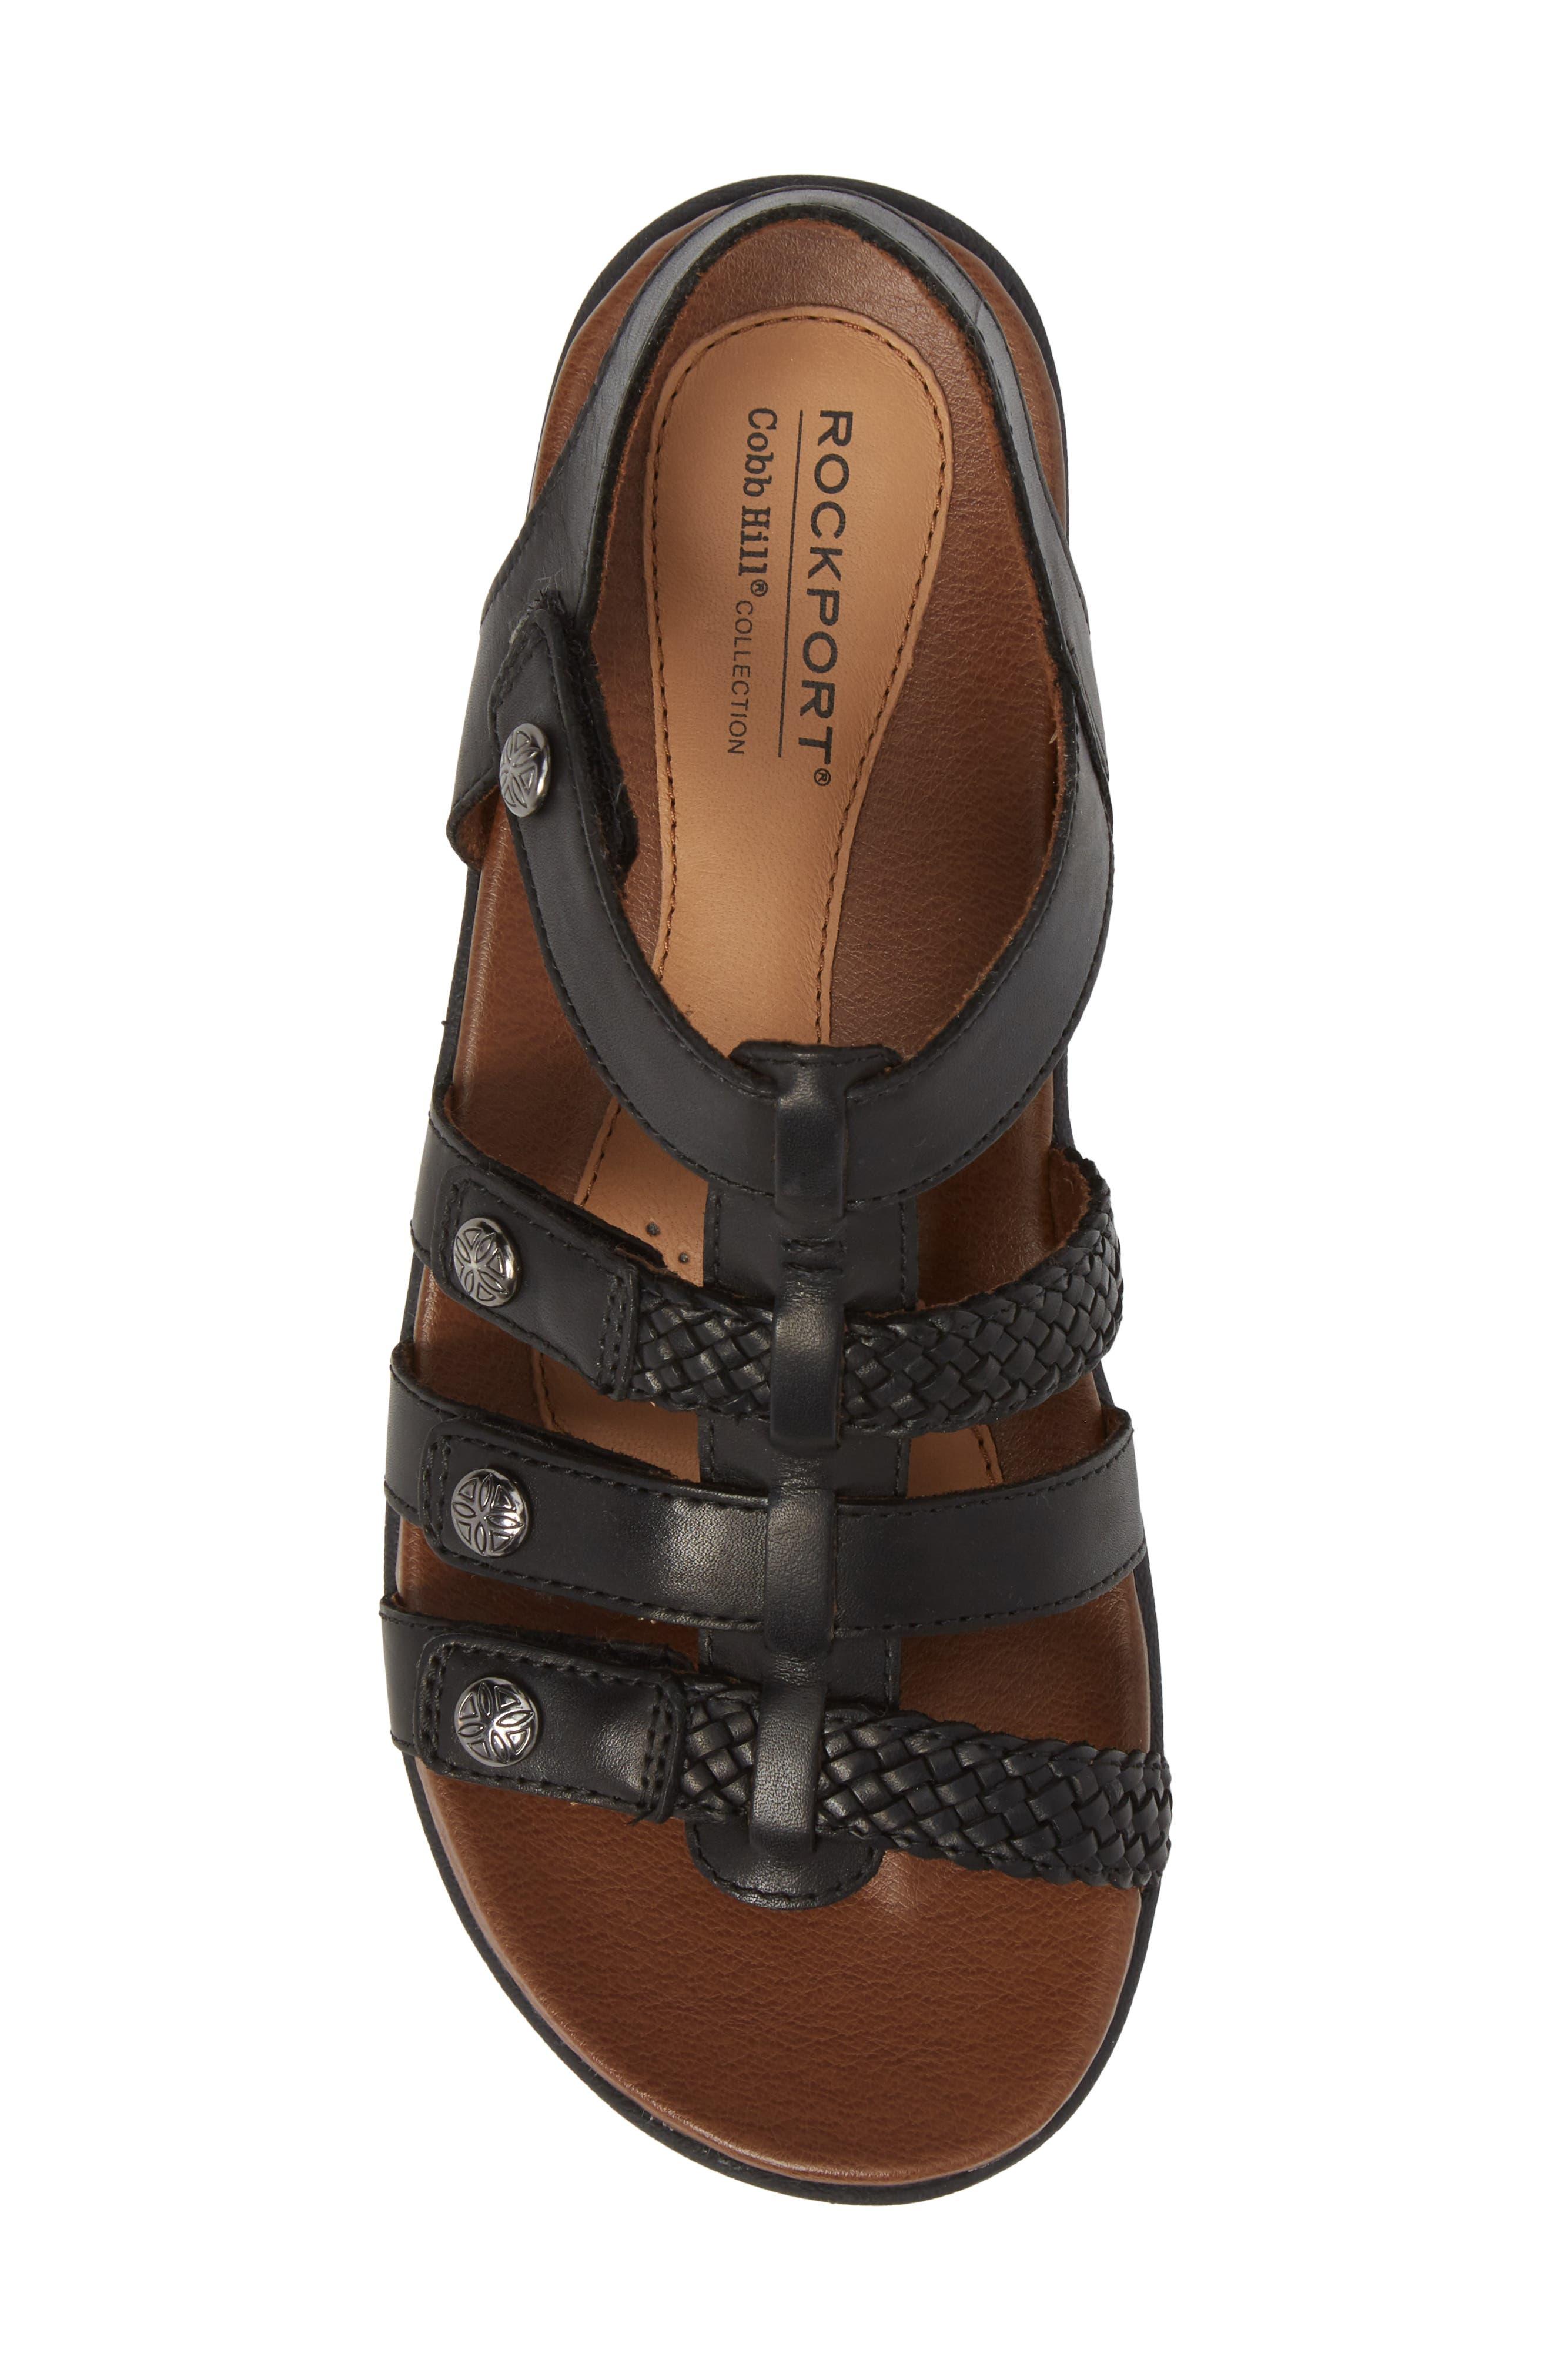 Rubey T-Strap Sandal,                             Alternate thumbnail 5, color,                             BLACK LEATHER